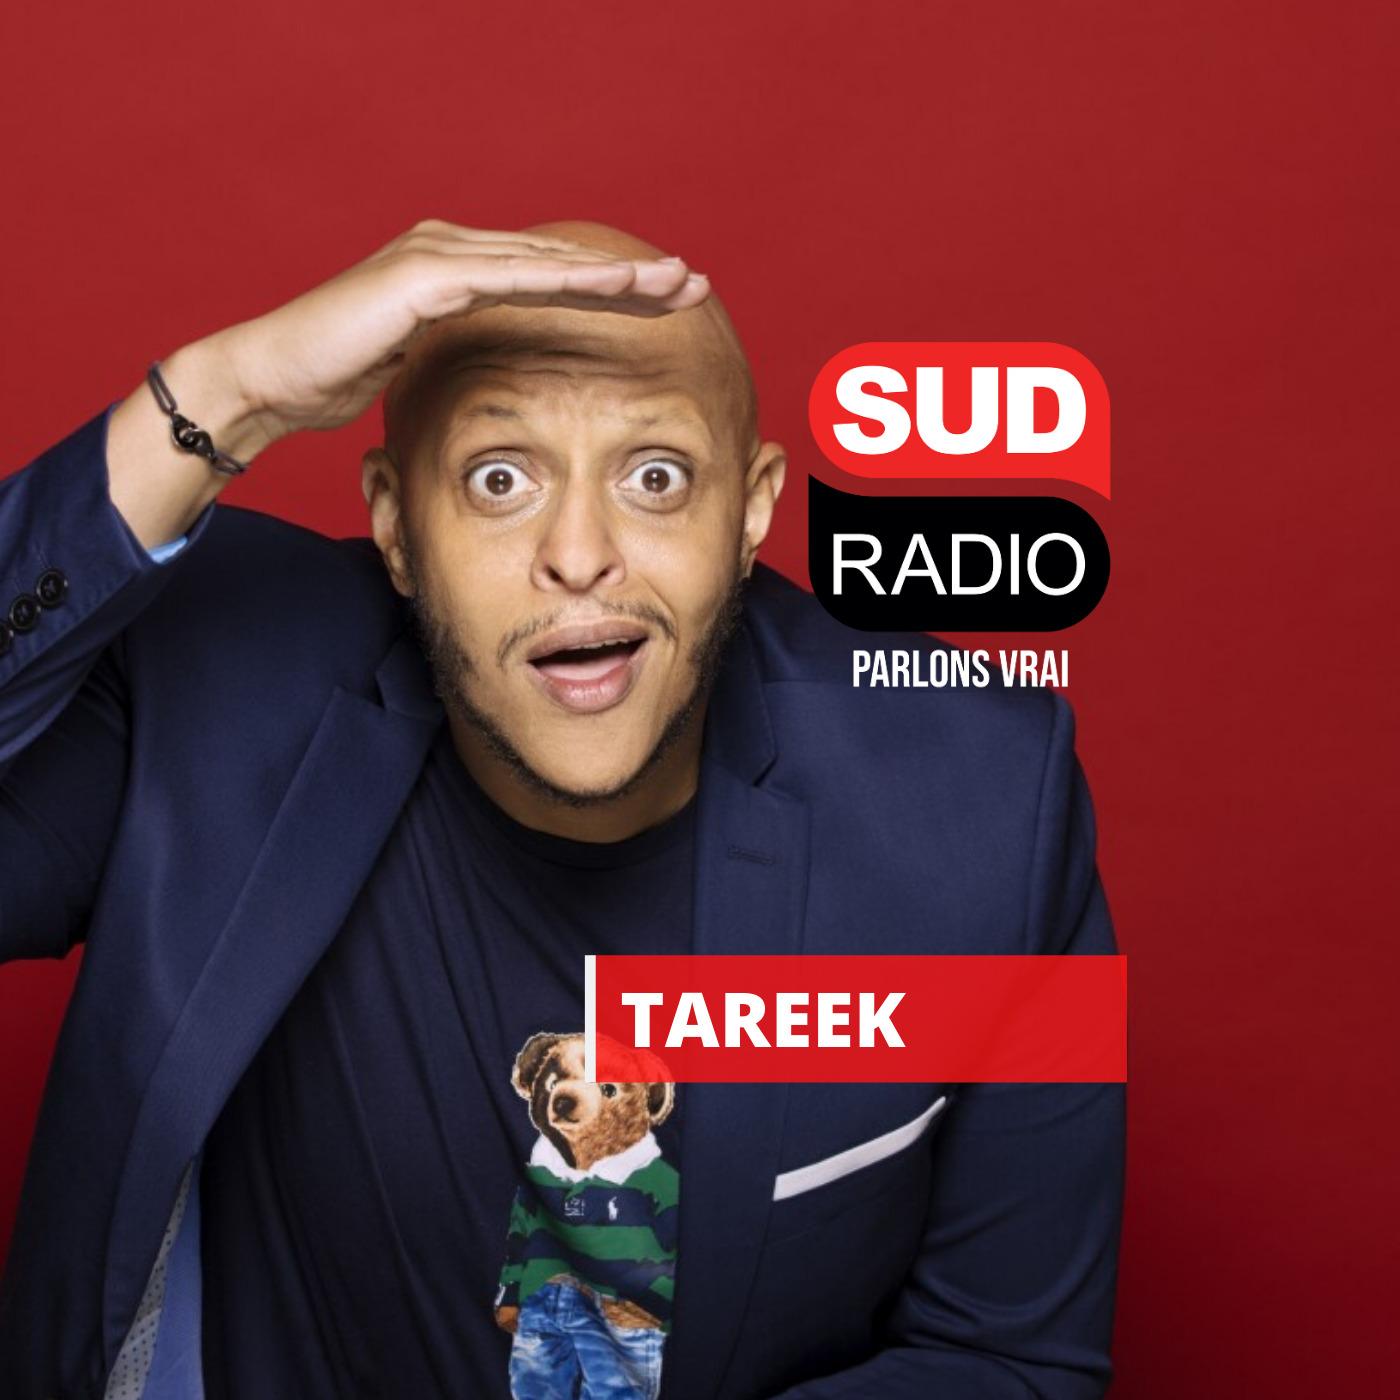 Image 1: Tareek